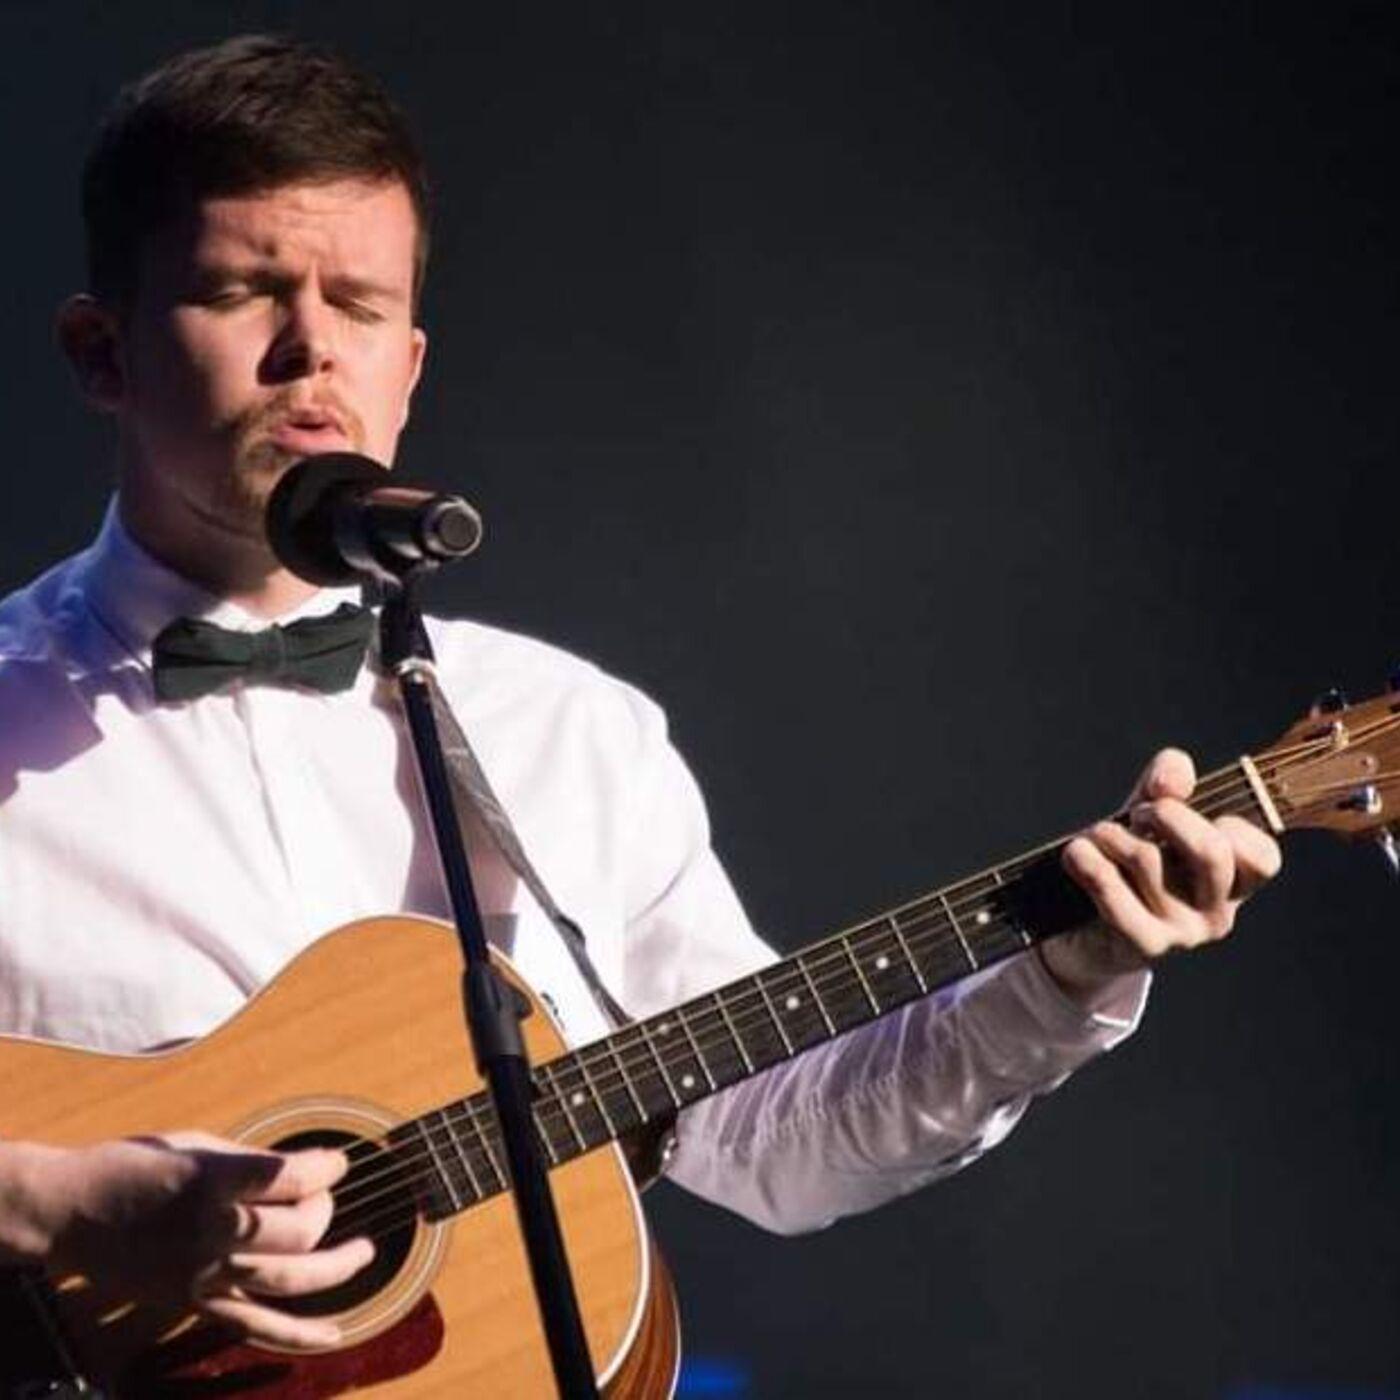 Ireland: Sights, Stories -- And Joe Sings An Irish Ballad!